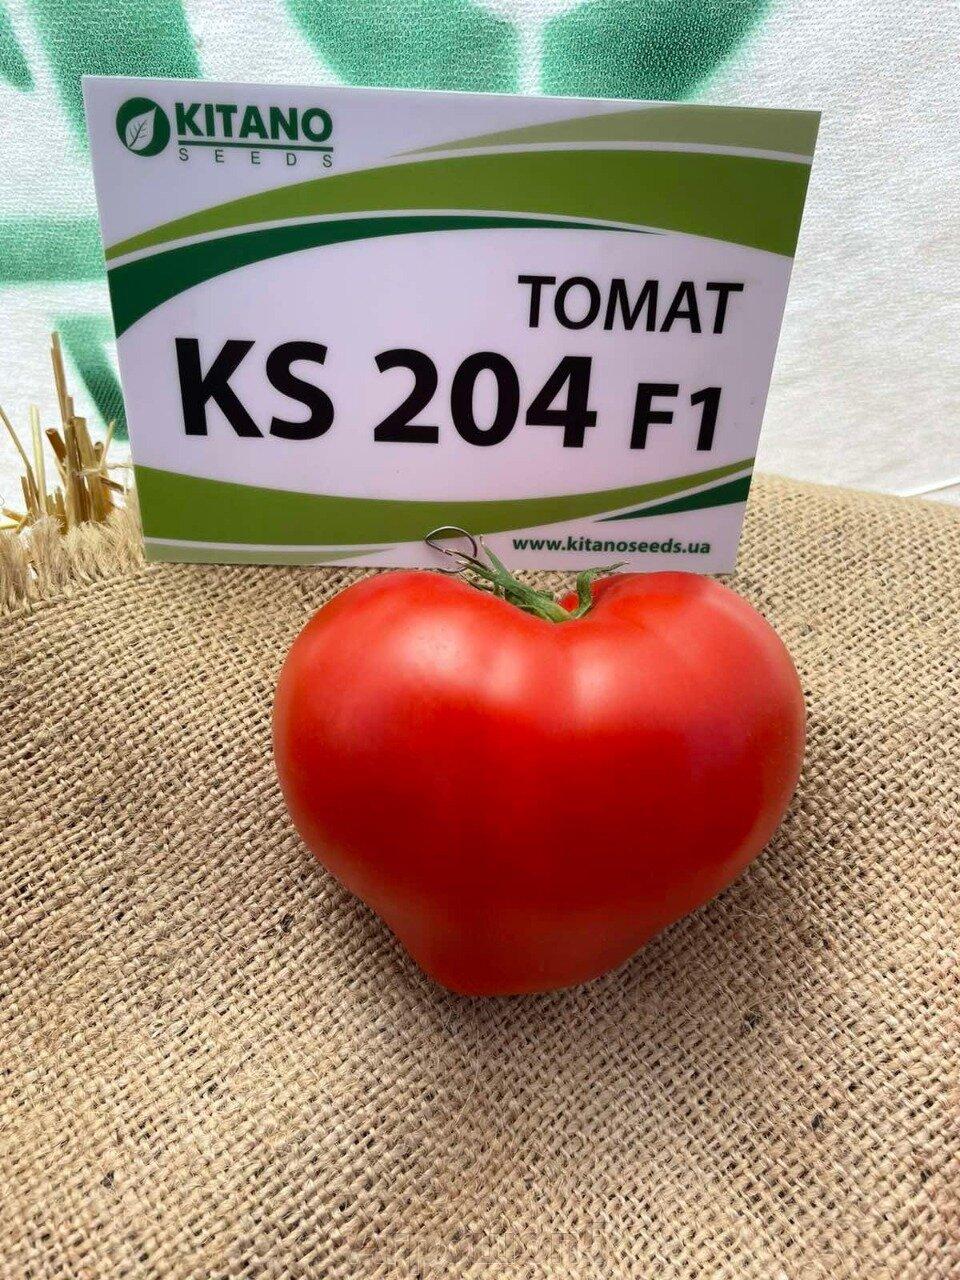 День поля по томатам от компании Kitano - фото pic_4e6688d174df6c1cdff99c75b6ae26b0_1920x9000_1.jpg